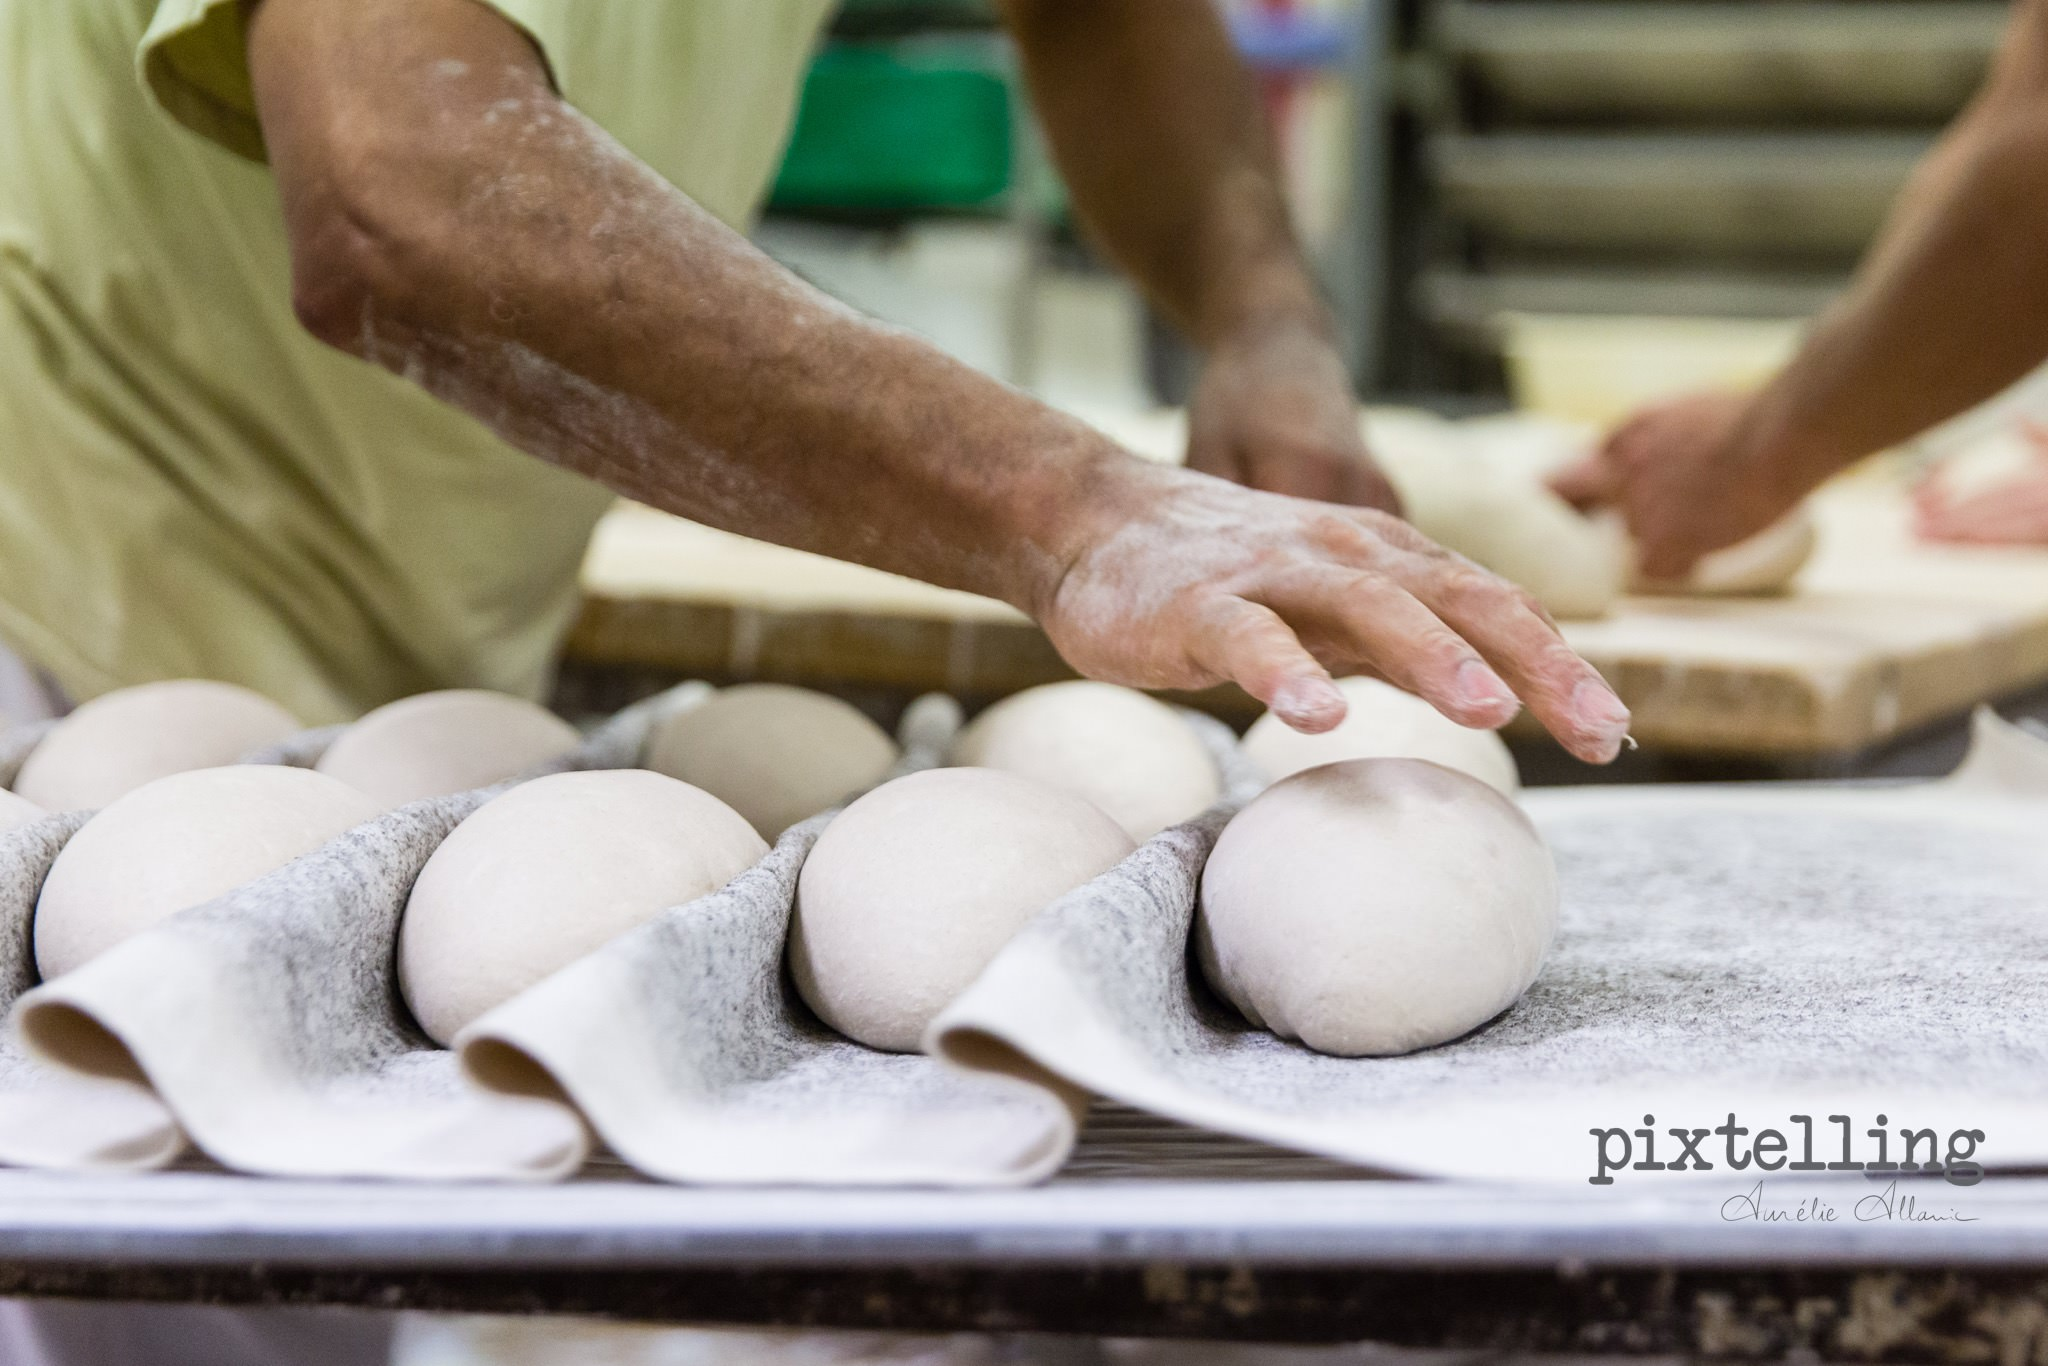 boules de pain photographe artisan grenoble pixtelling